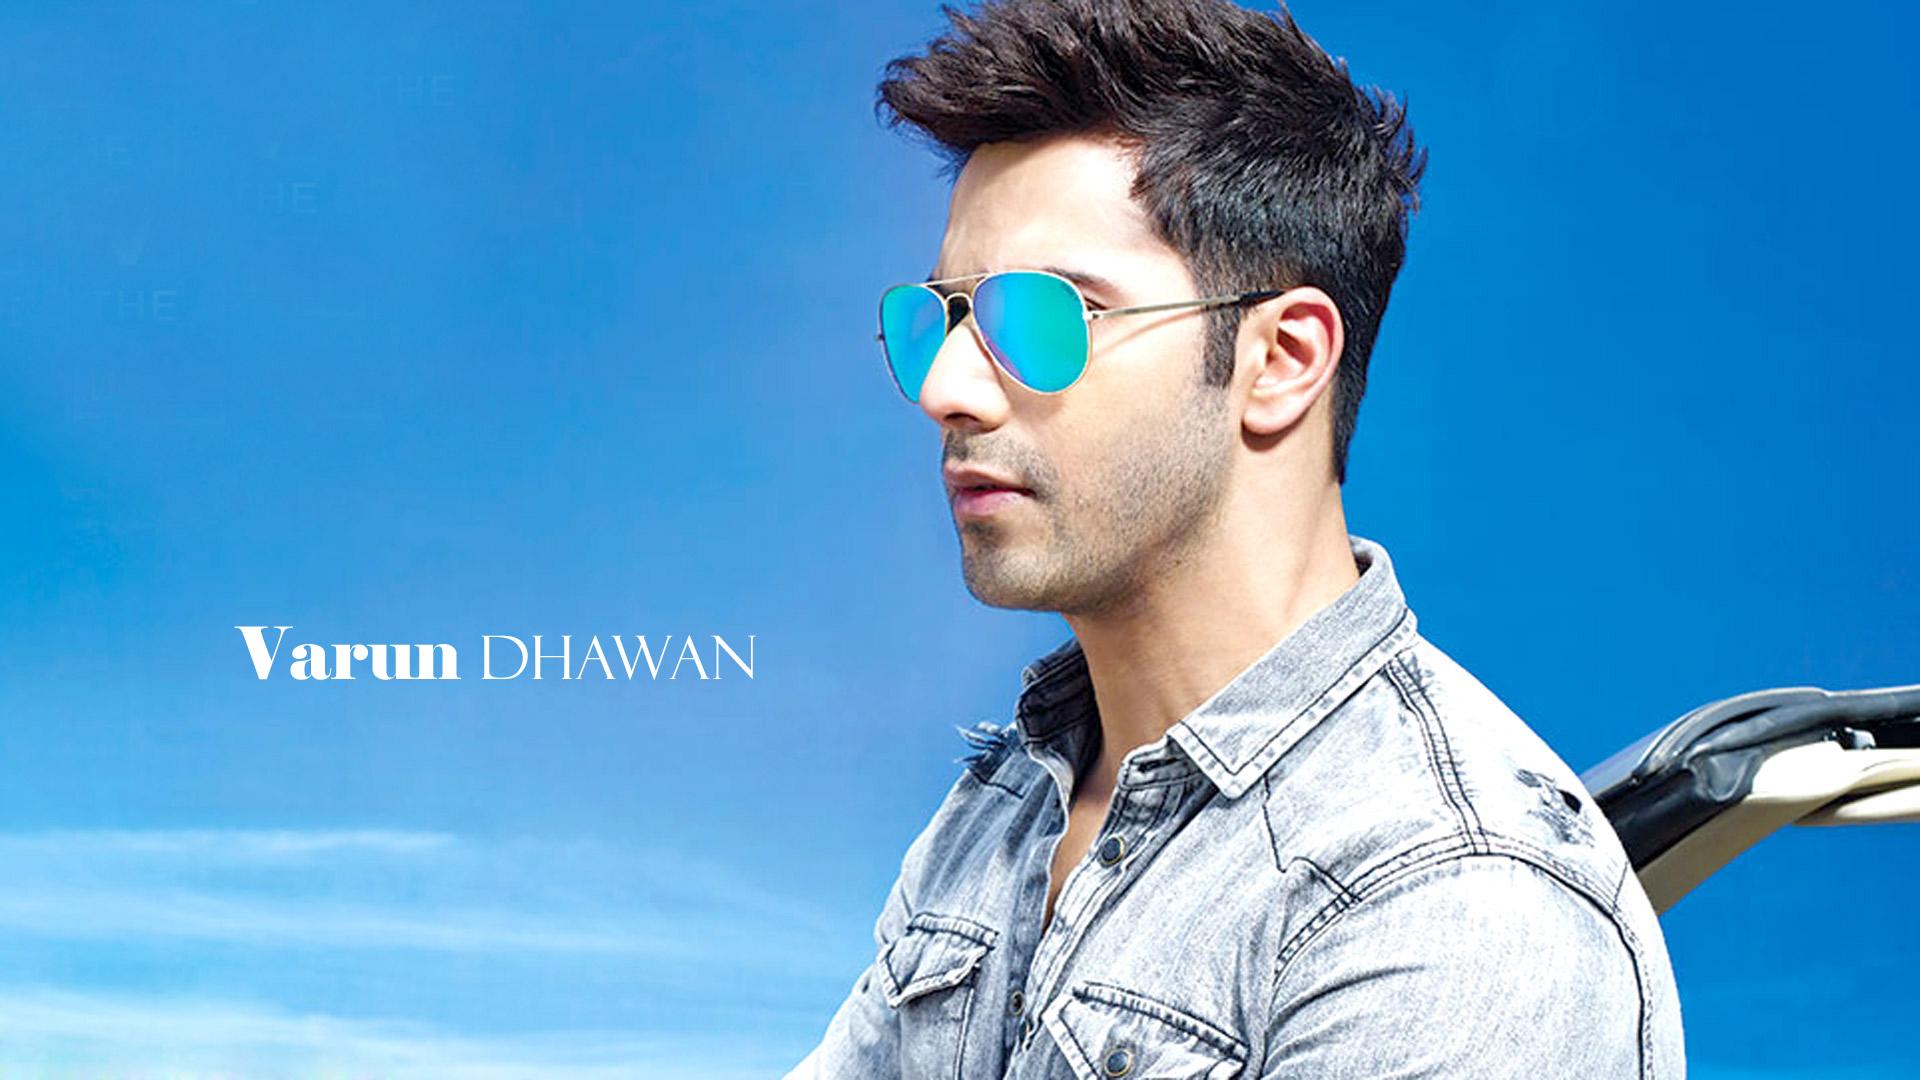 Varun Dhawan Pic